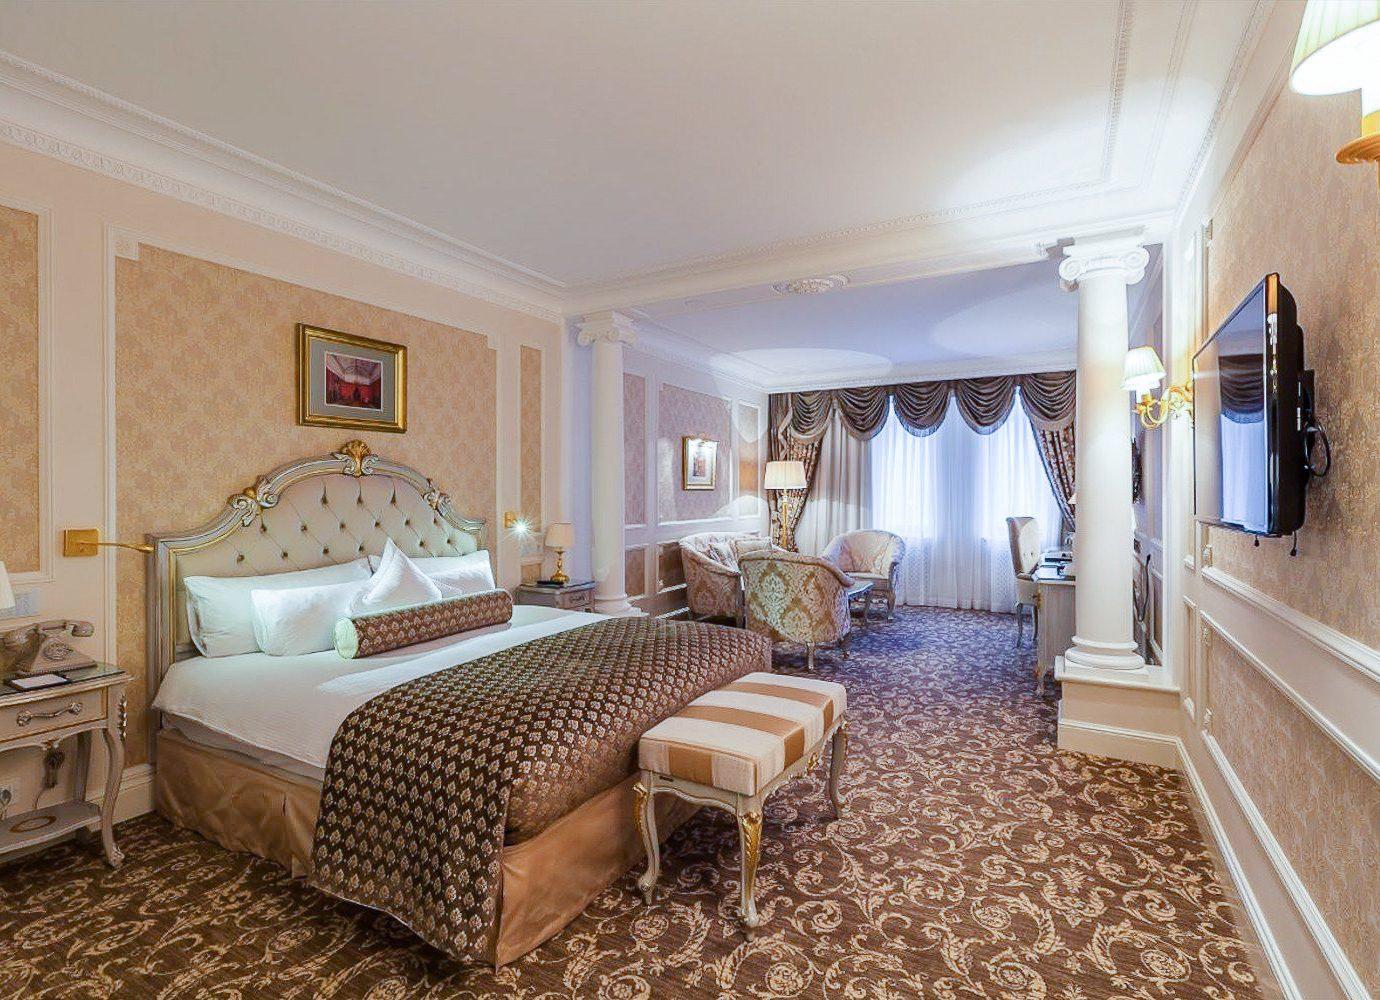 Hotels Luxury Travel indoor floor wall room ceiling Suite Bedroom interior design Living estate real estate home hotel furniture area